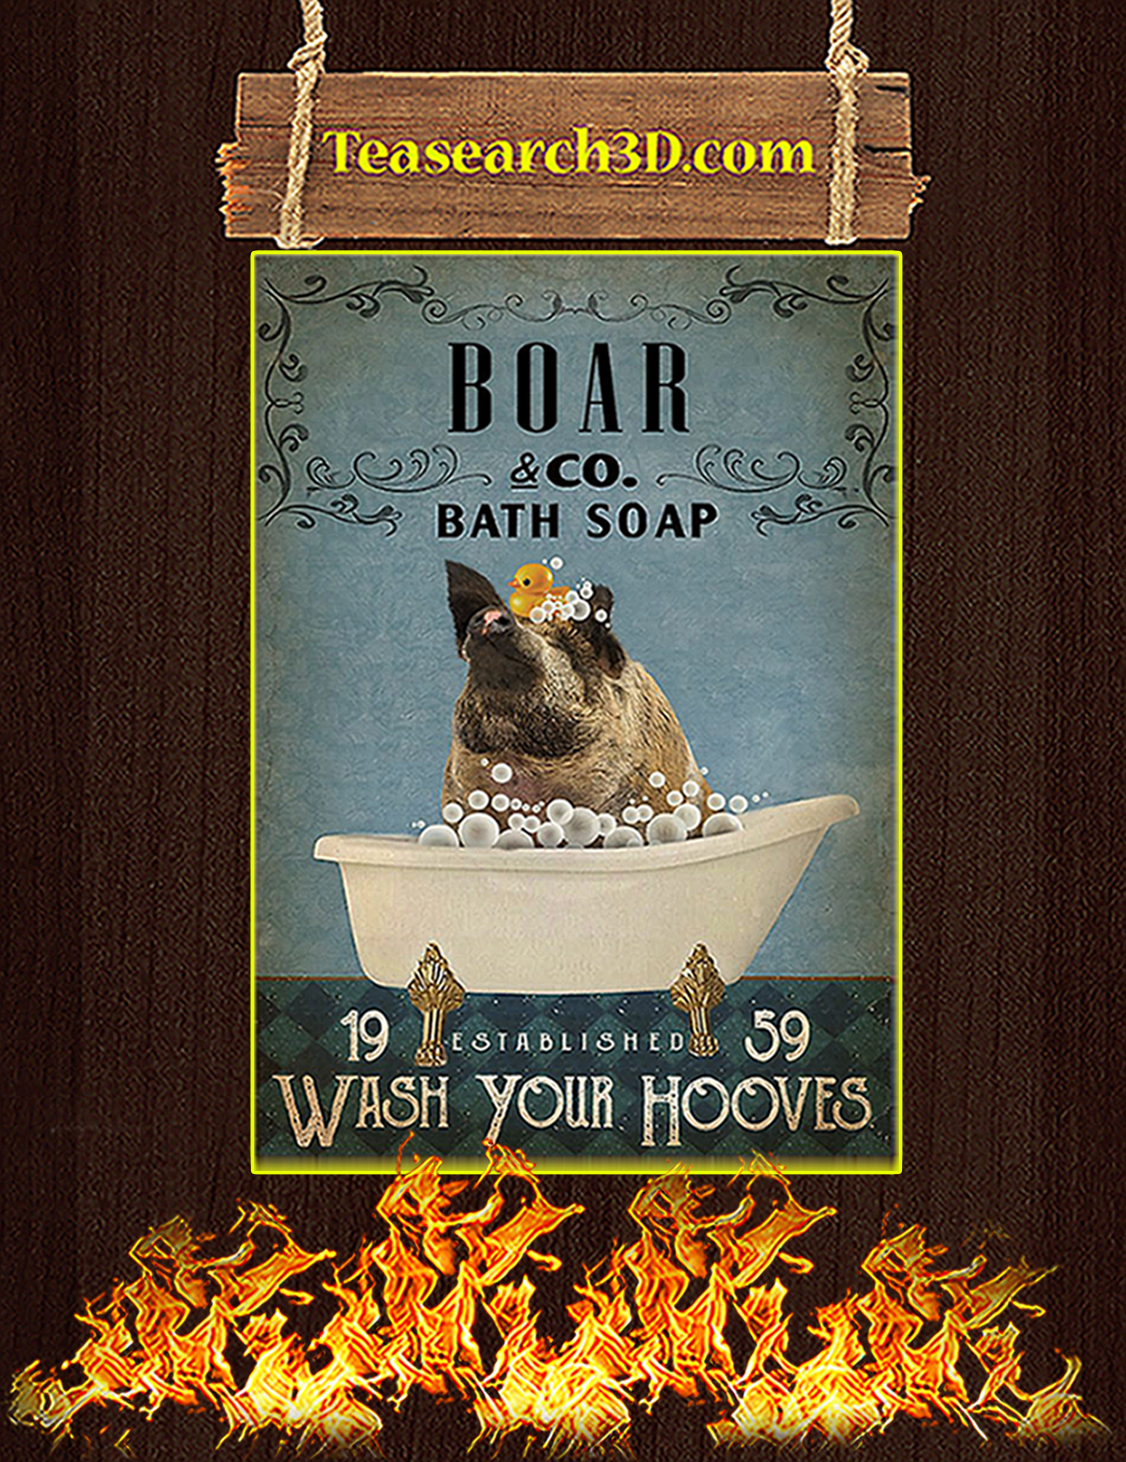 Vintage Bath Soap Boar Poster A3